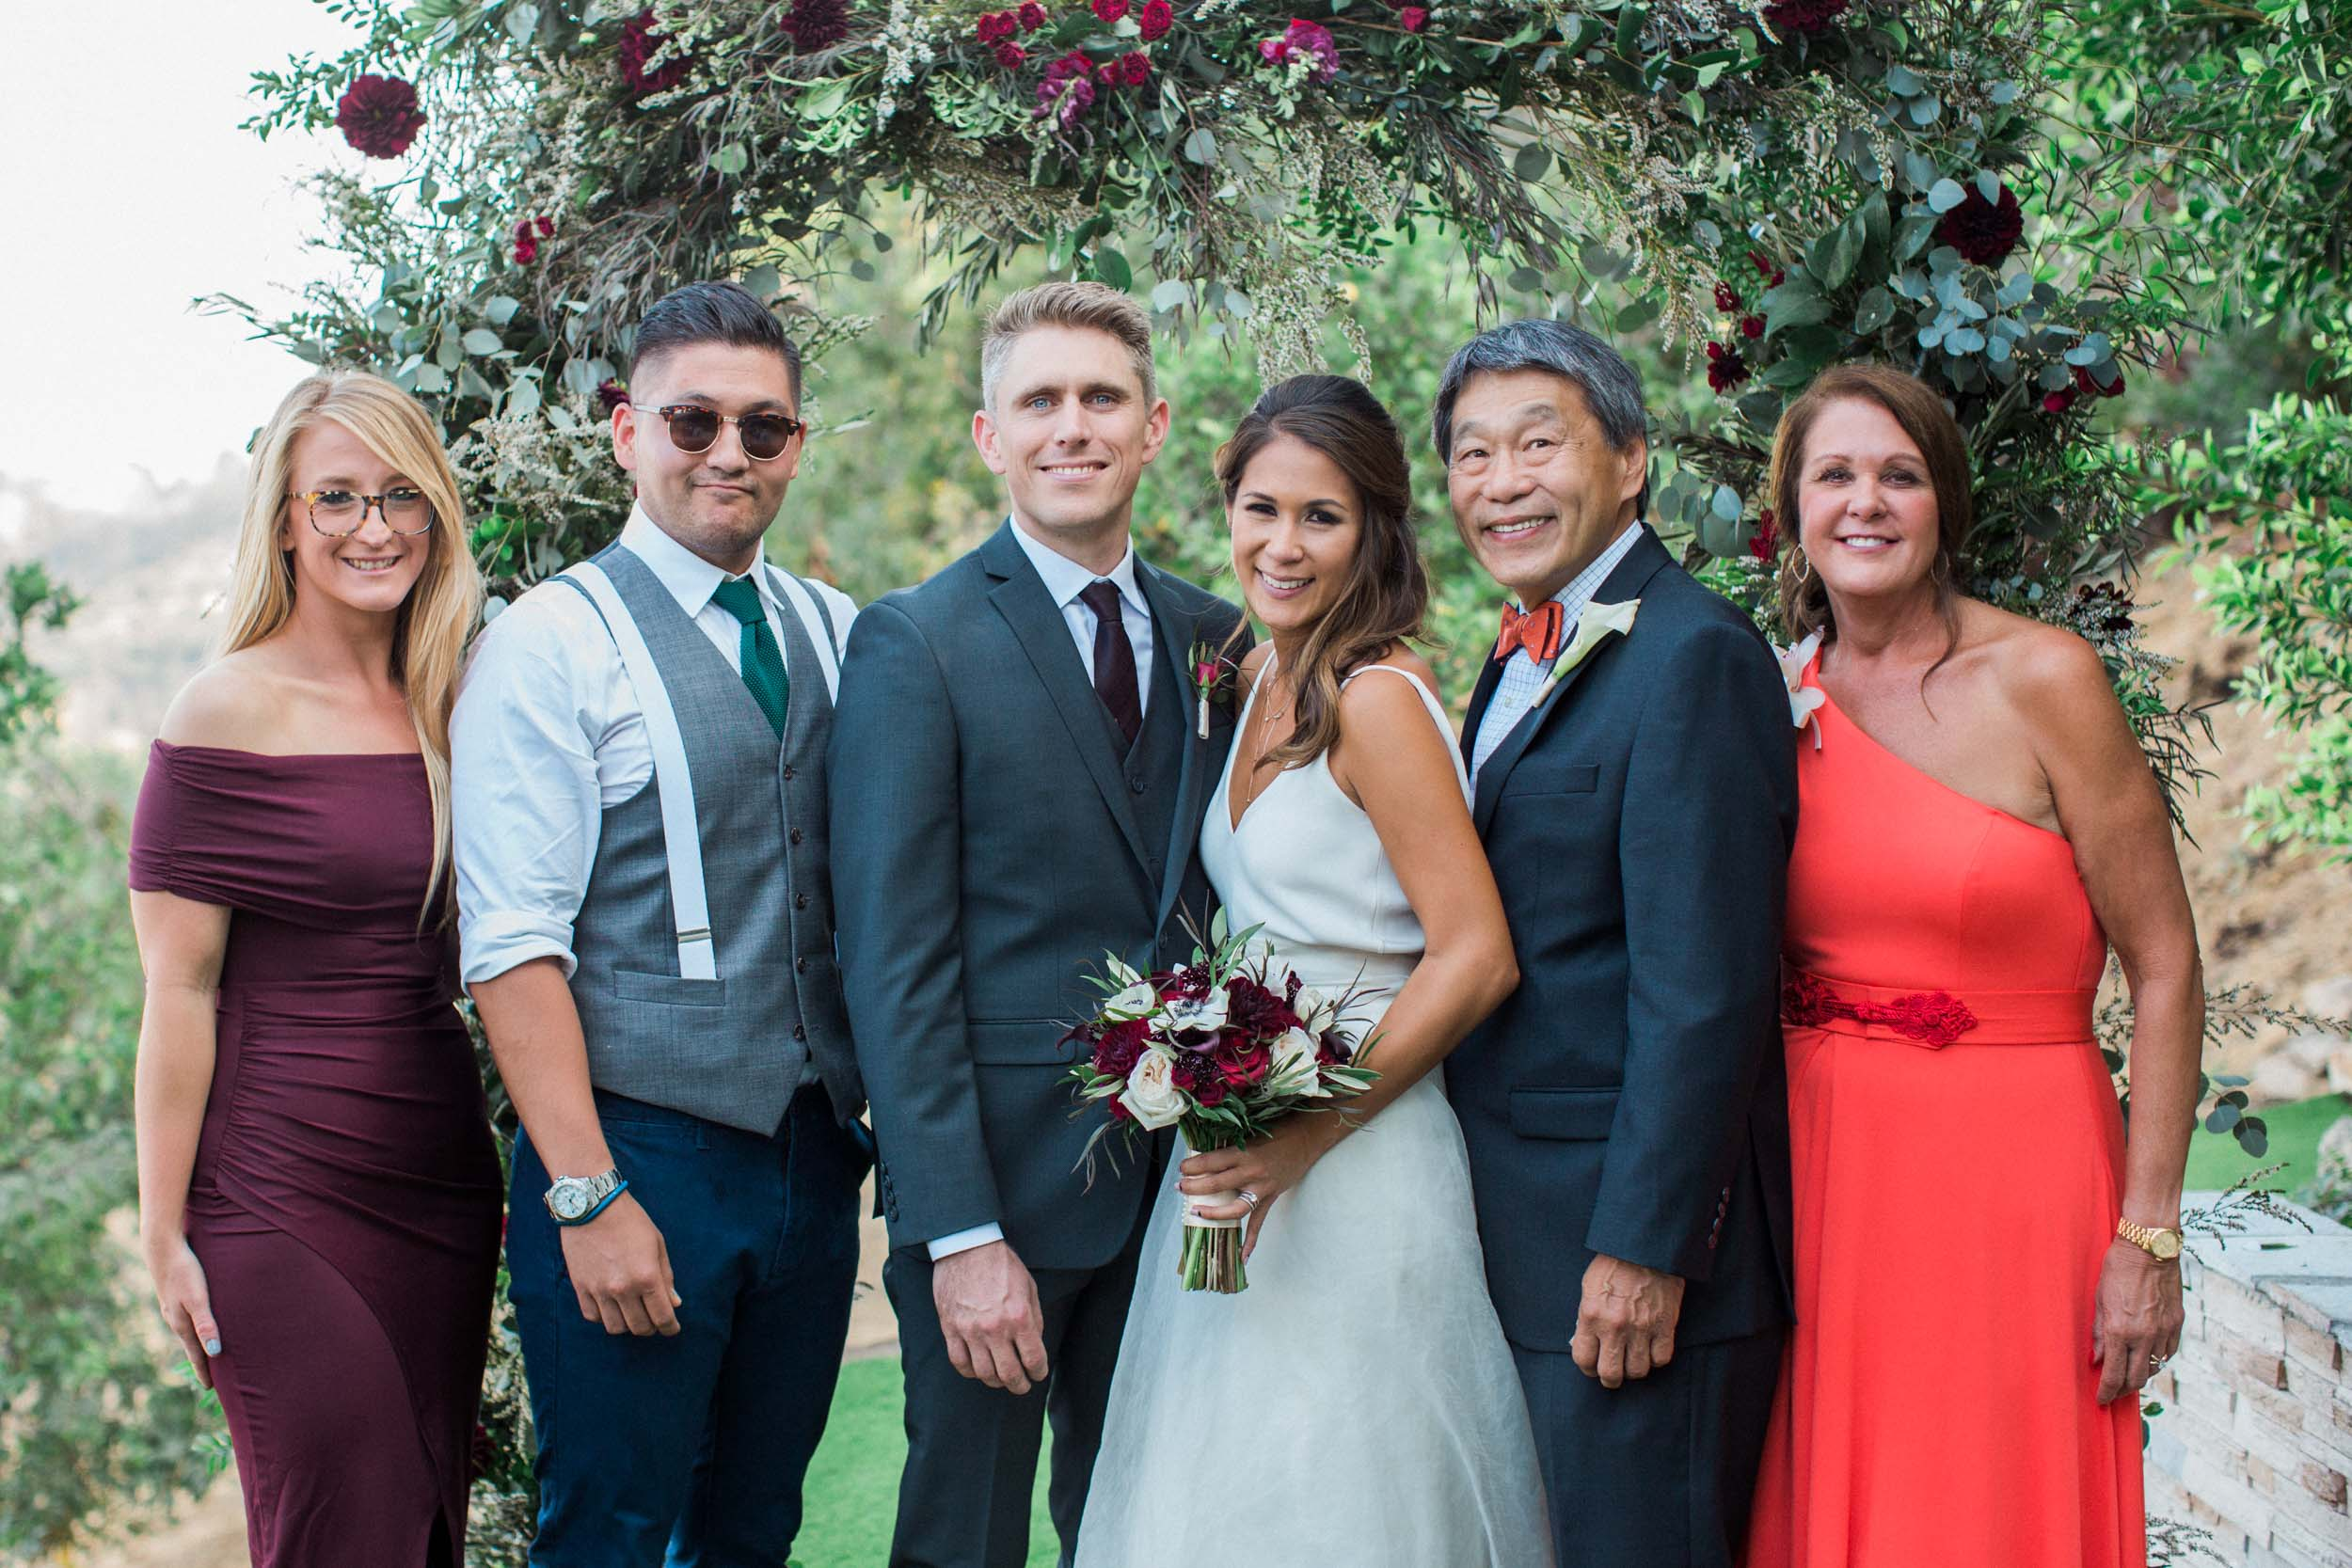 BKM-Photography-Highland-Park-Los-Angeles-Backyard-Wedding-0035.jpg